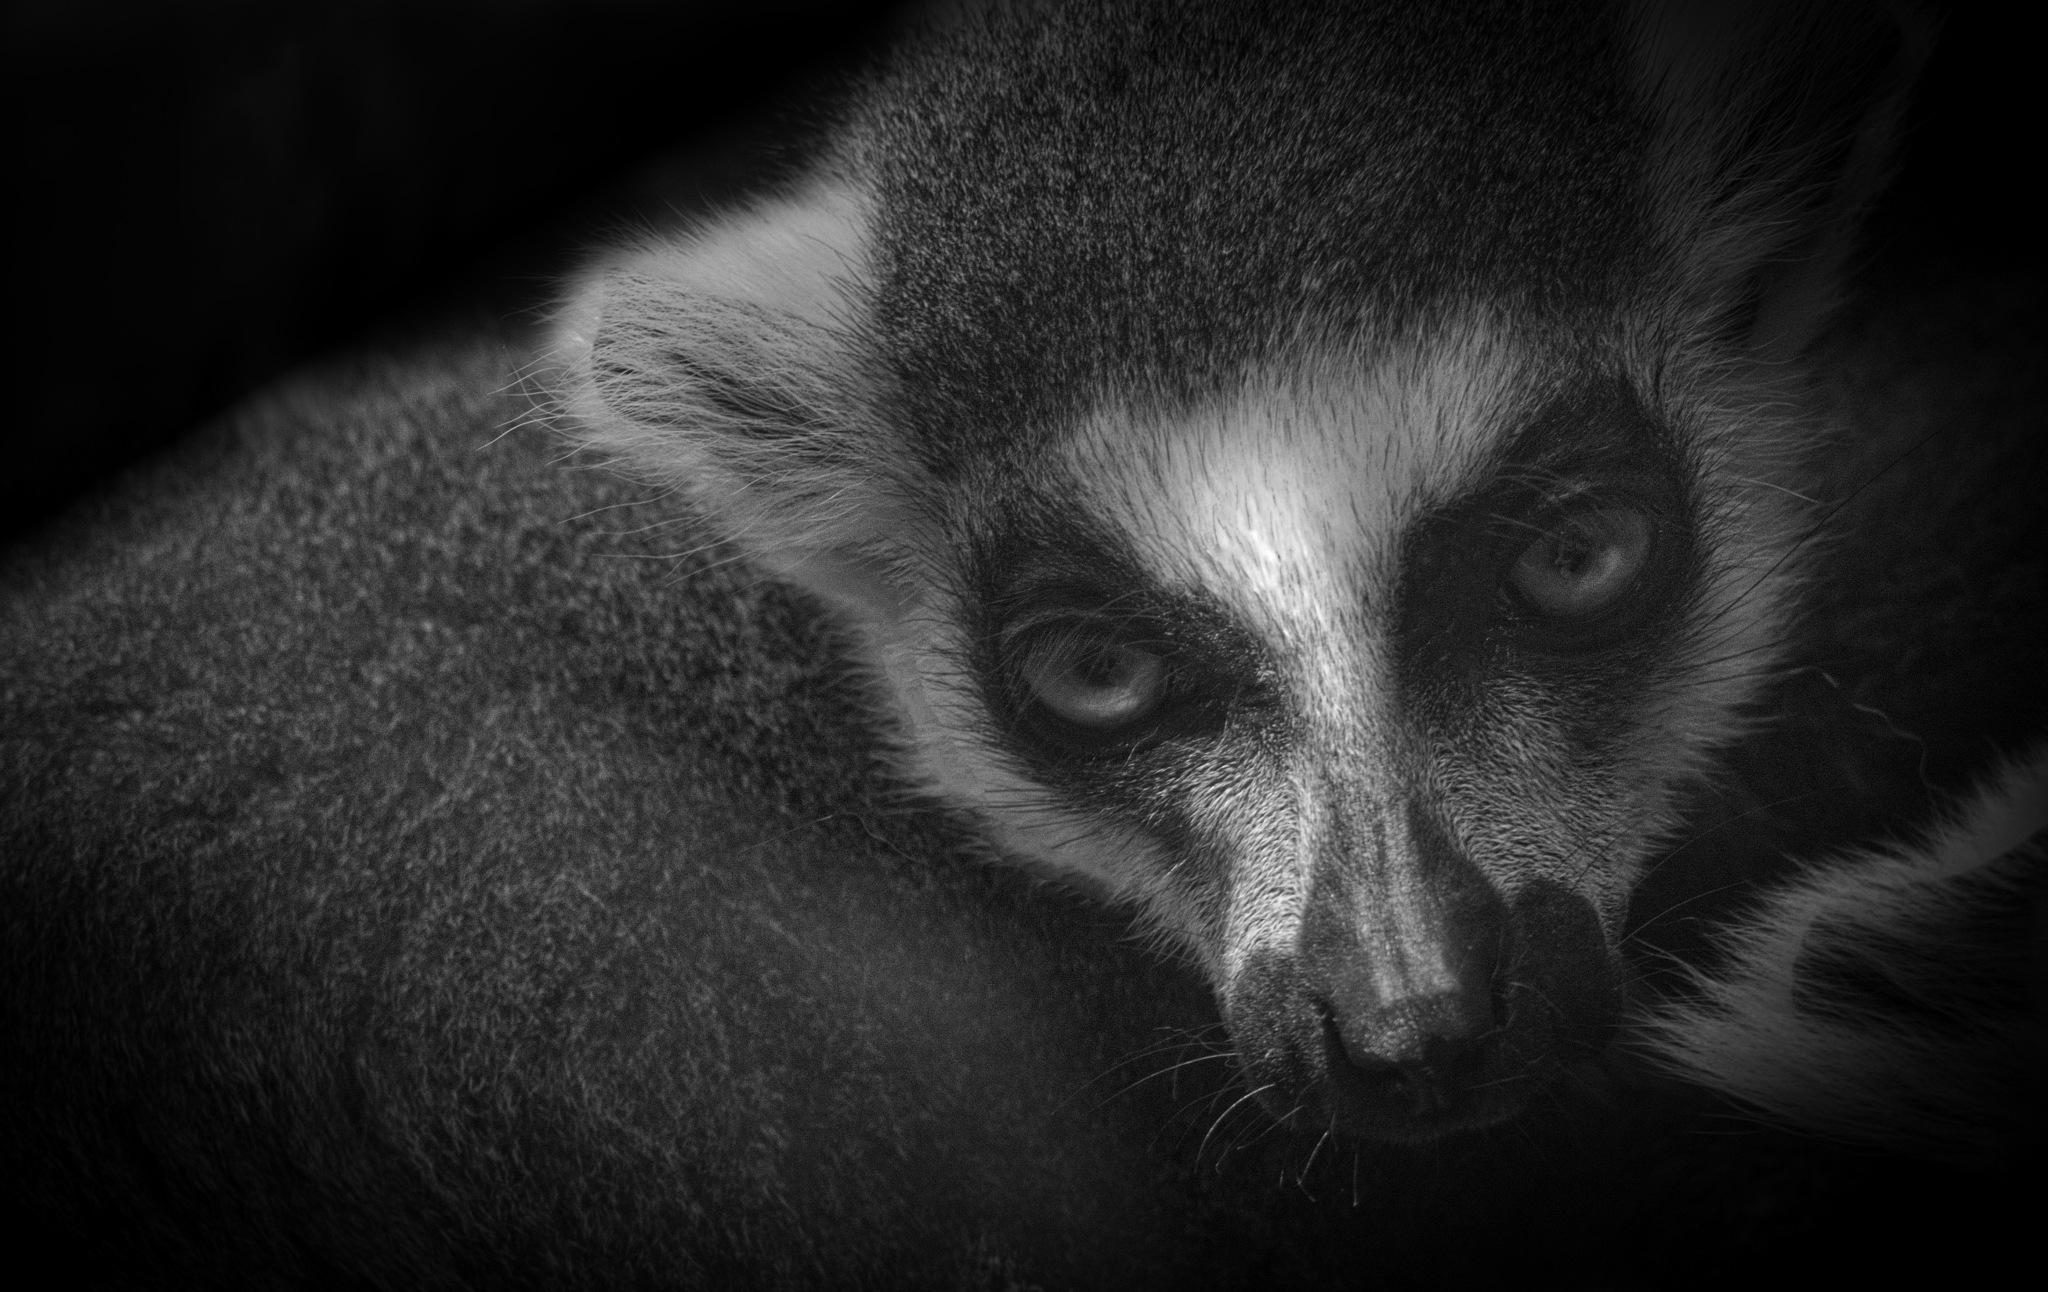 Lemur by Gary Tripp